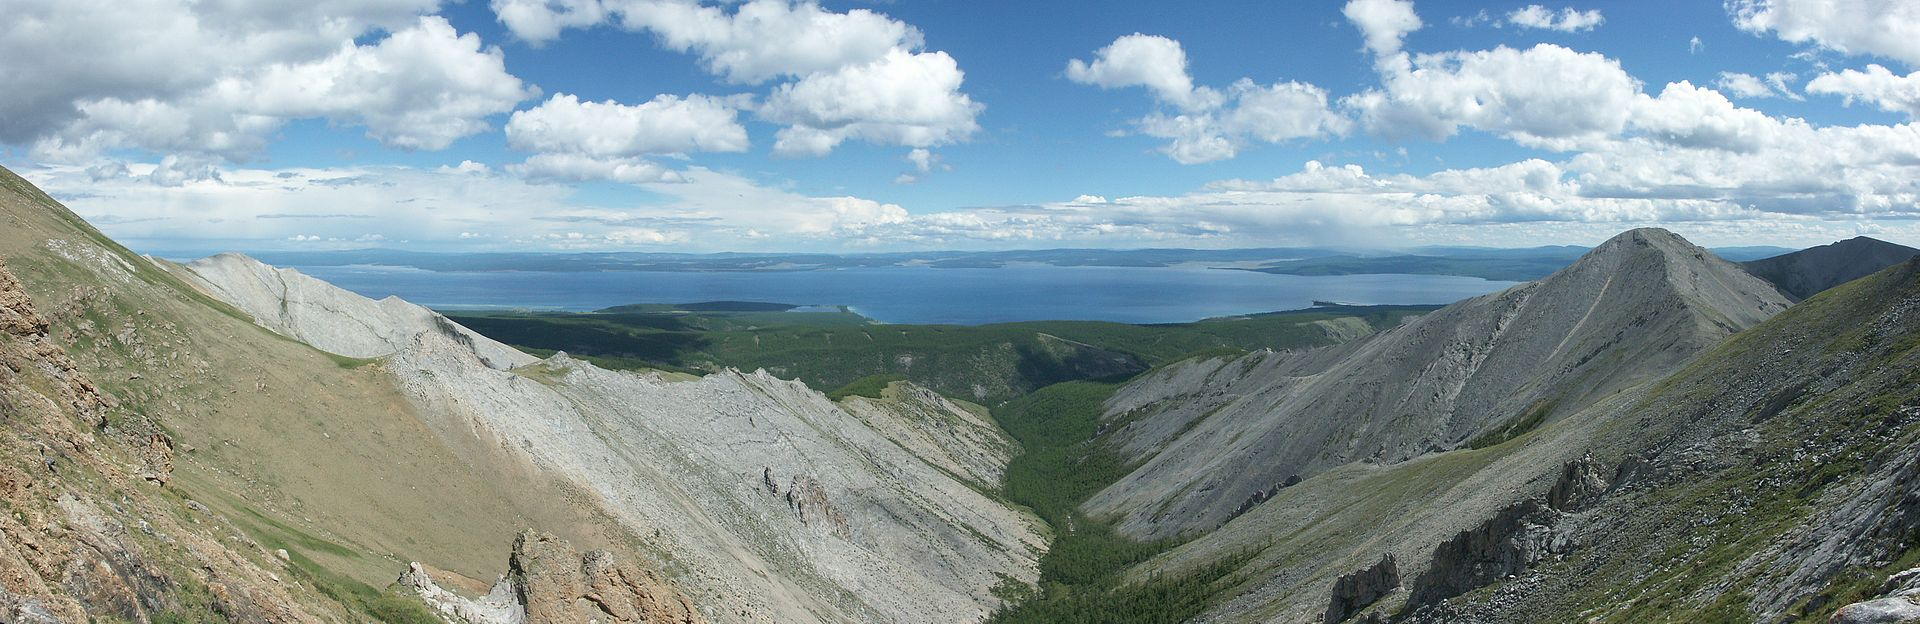 Panoramic_view_of_Lake_Khövsgöl.jpg